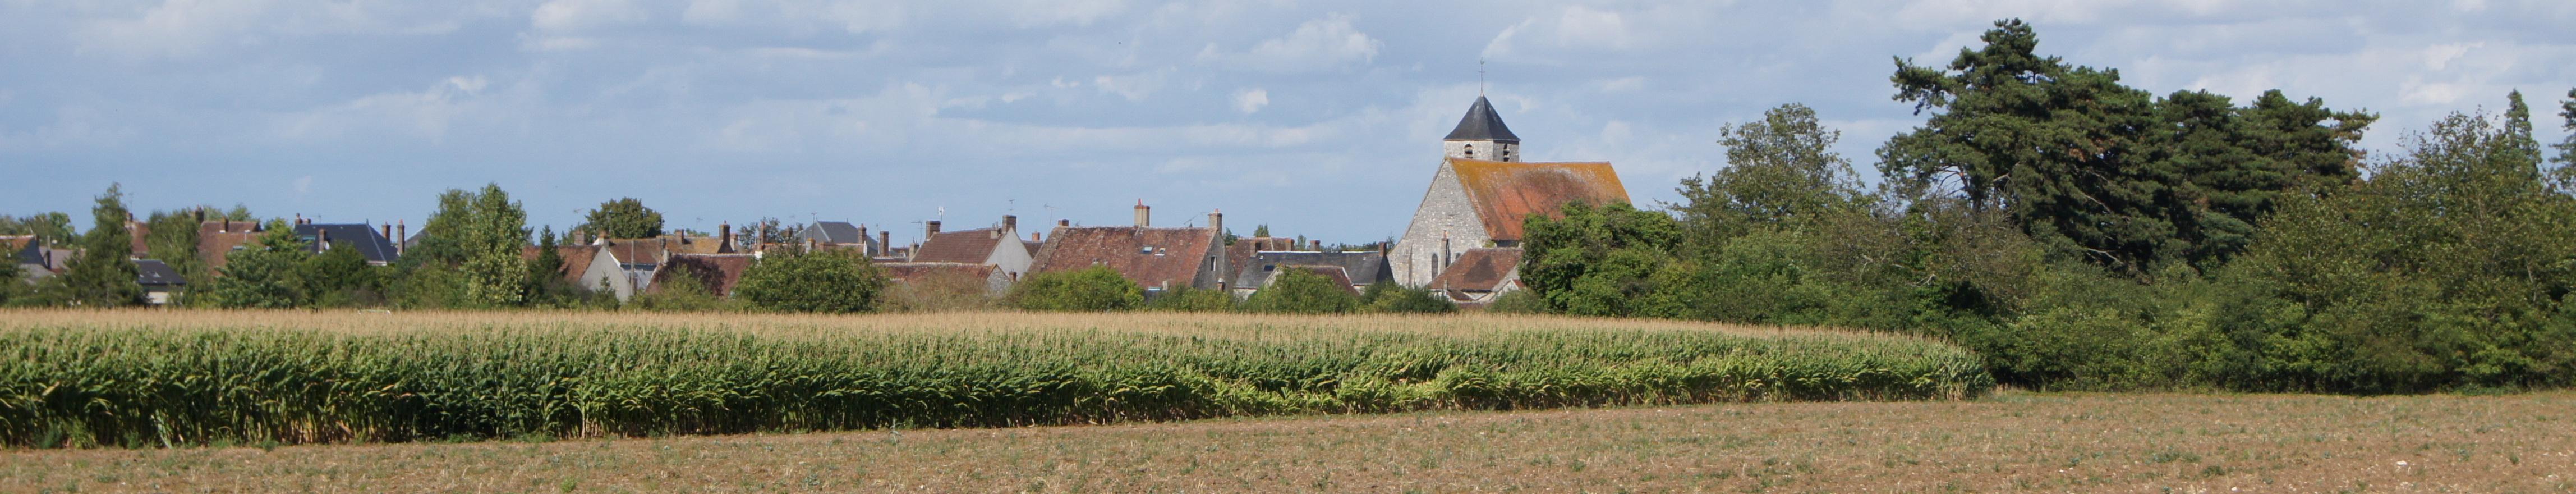 Montcresson